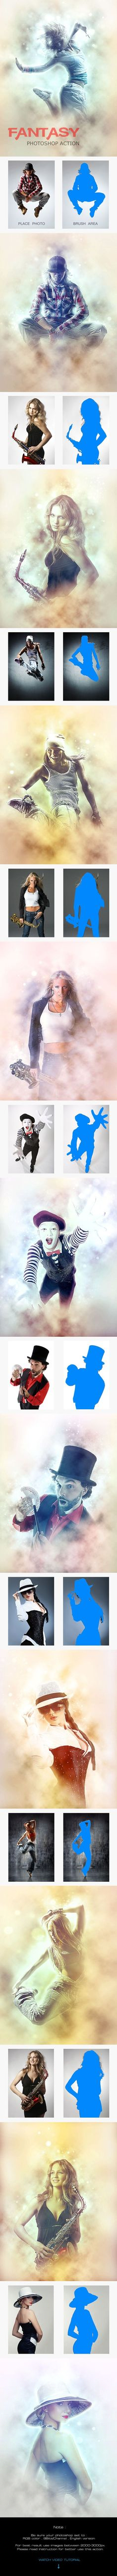 Fantasy - Photoshop Action #photoeffect Download: http://graphicriver.net/item/fantasy-photoshop-action/14104443?ref=ksioks